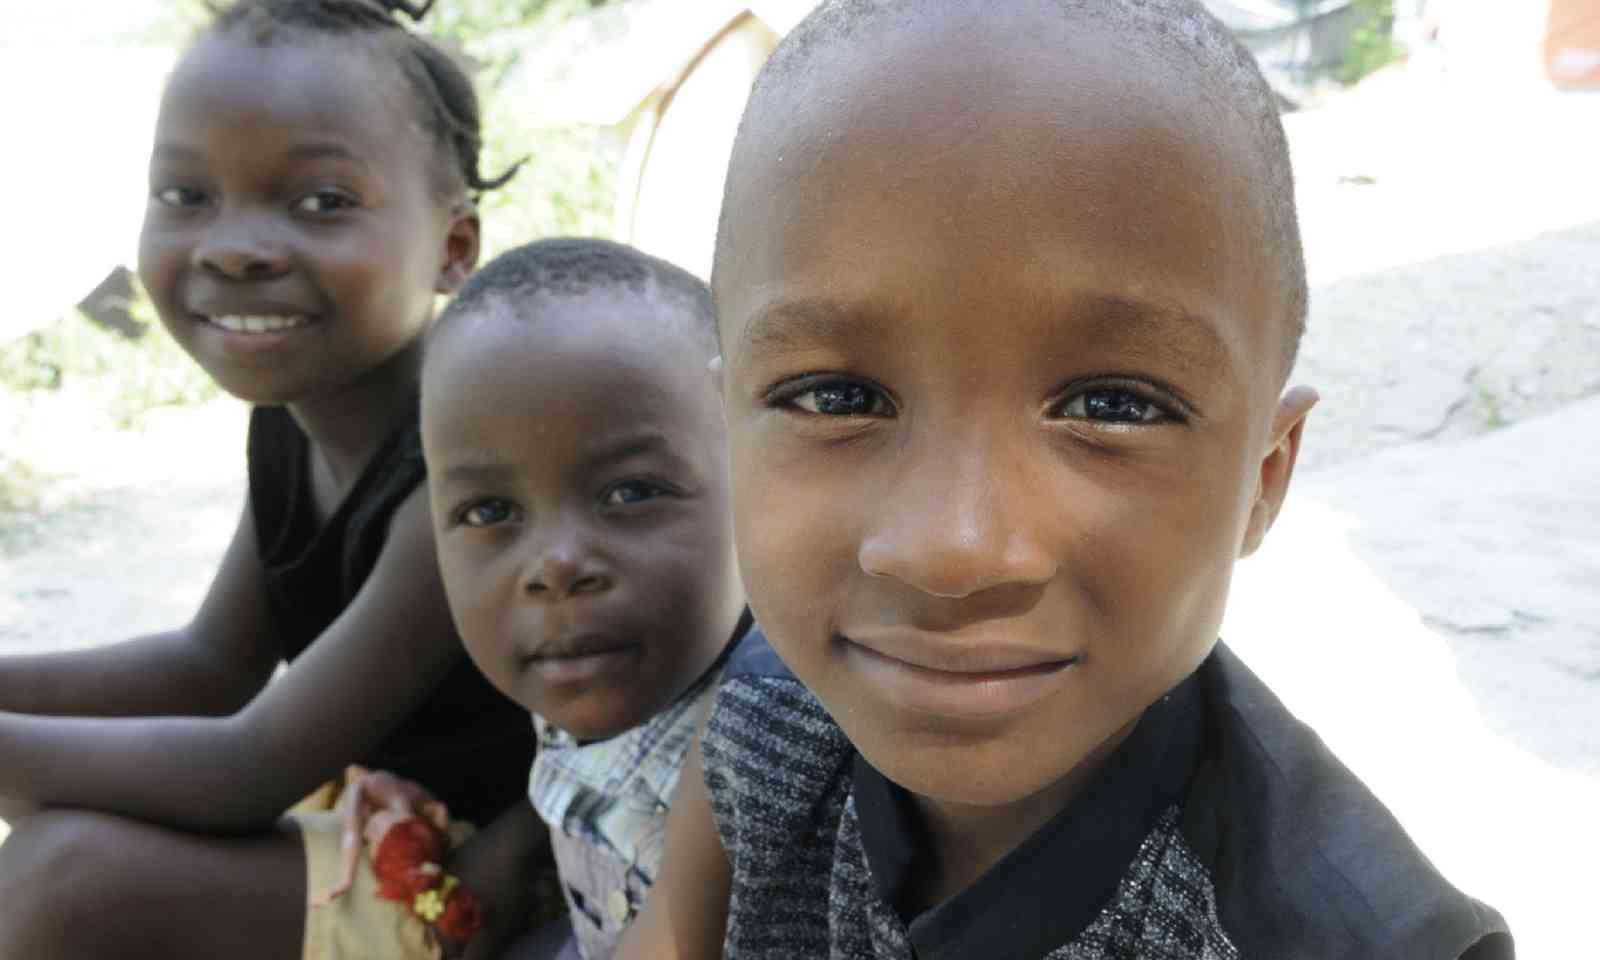 Kids in Port-au-Prince (Shutterstock)